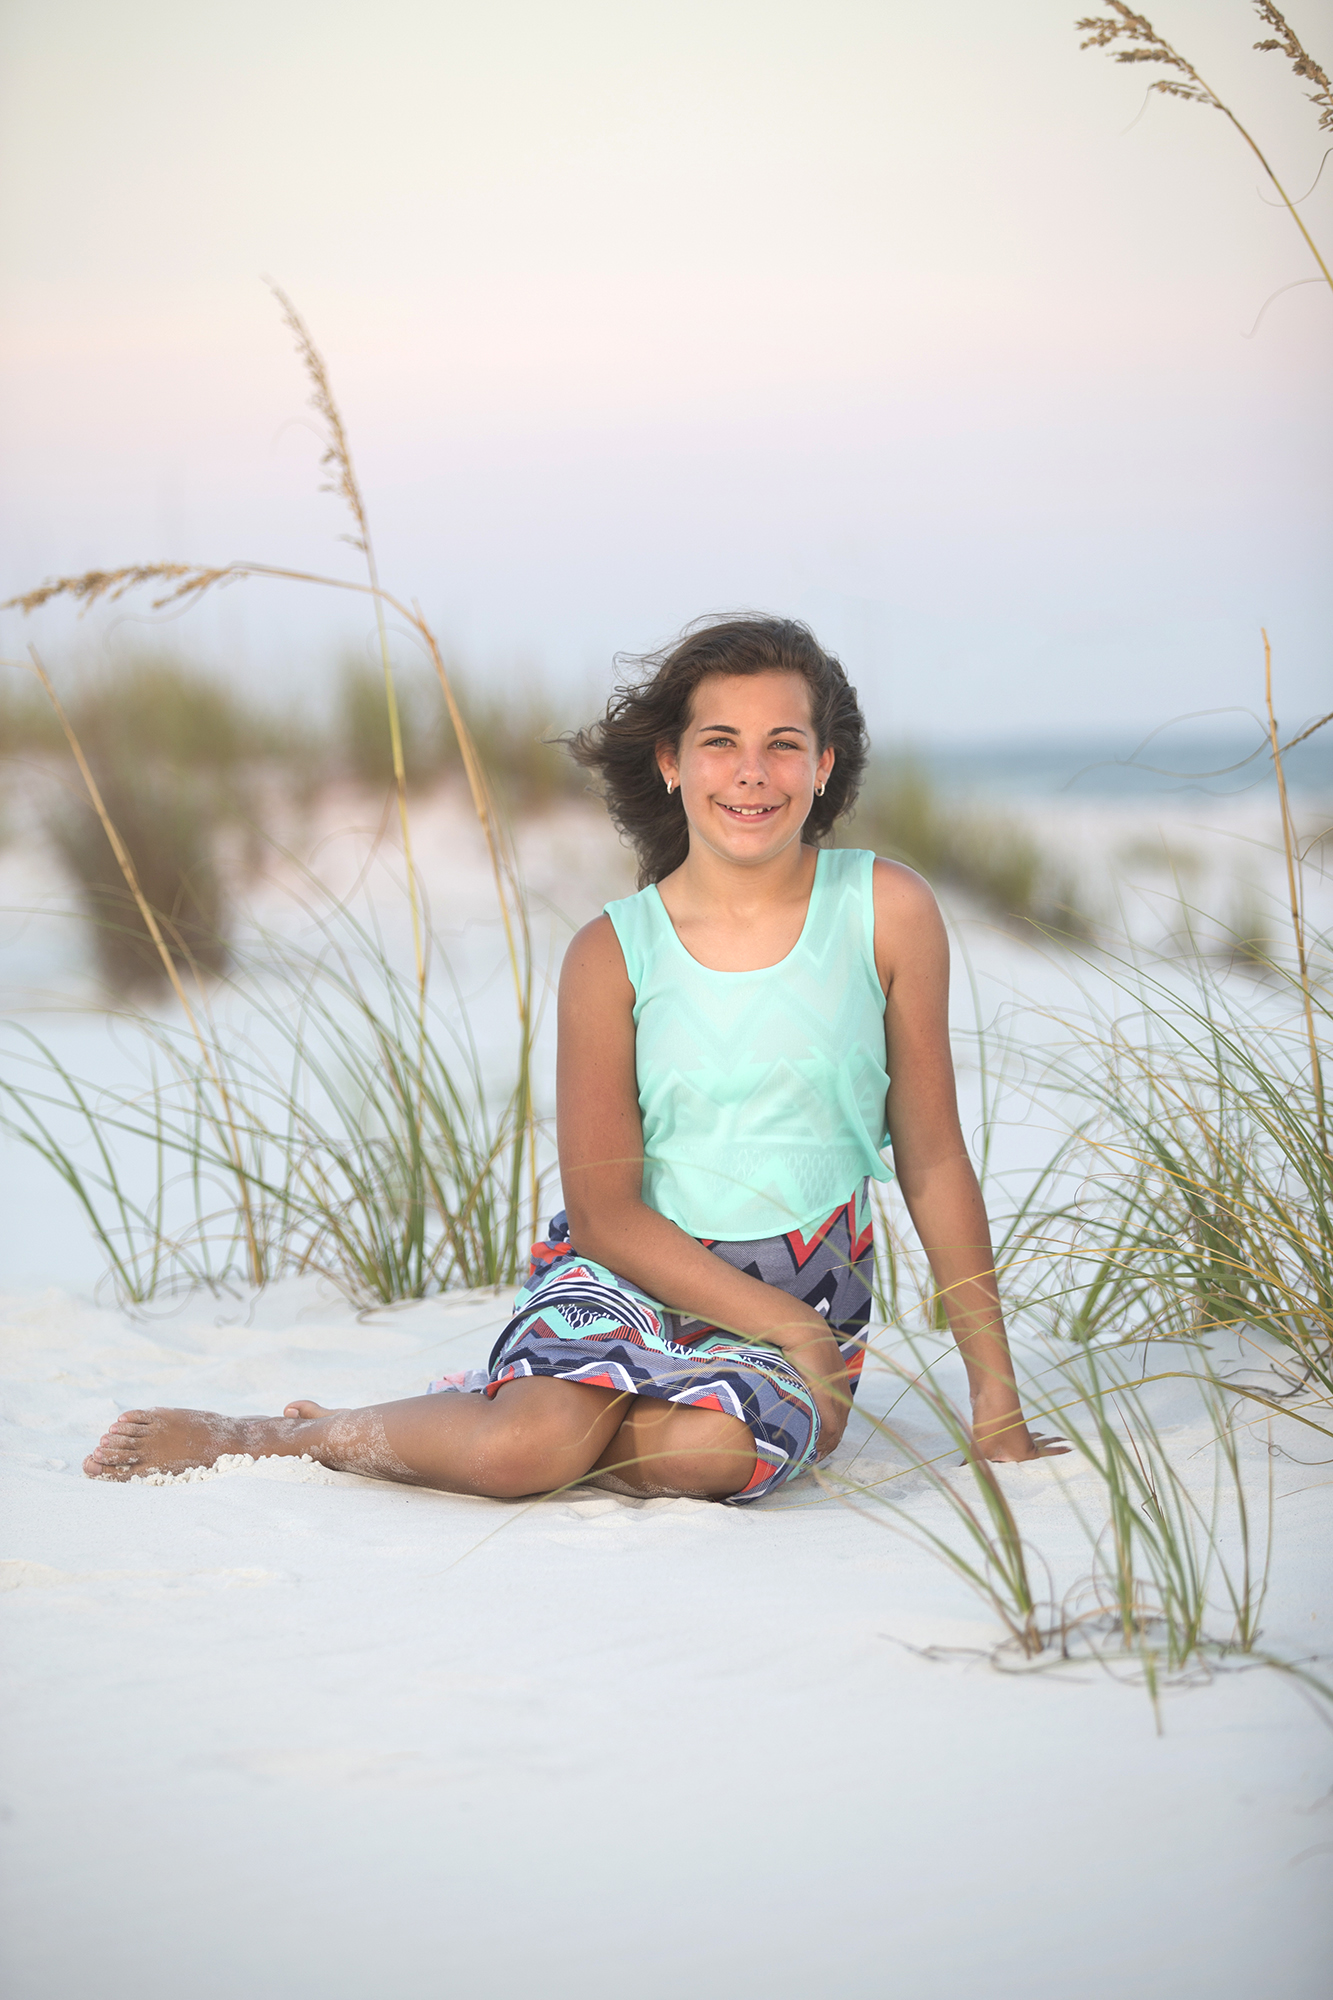 Beach Family Portrait Photographer Delray Beach, Florida